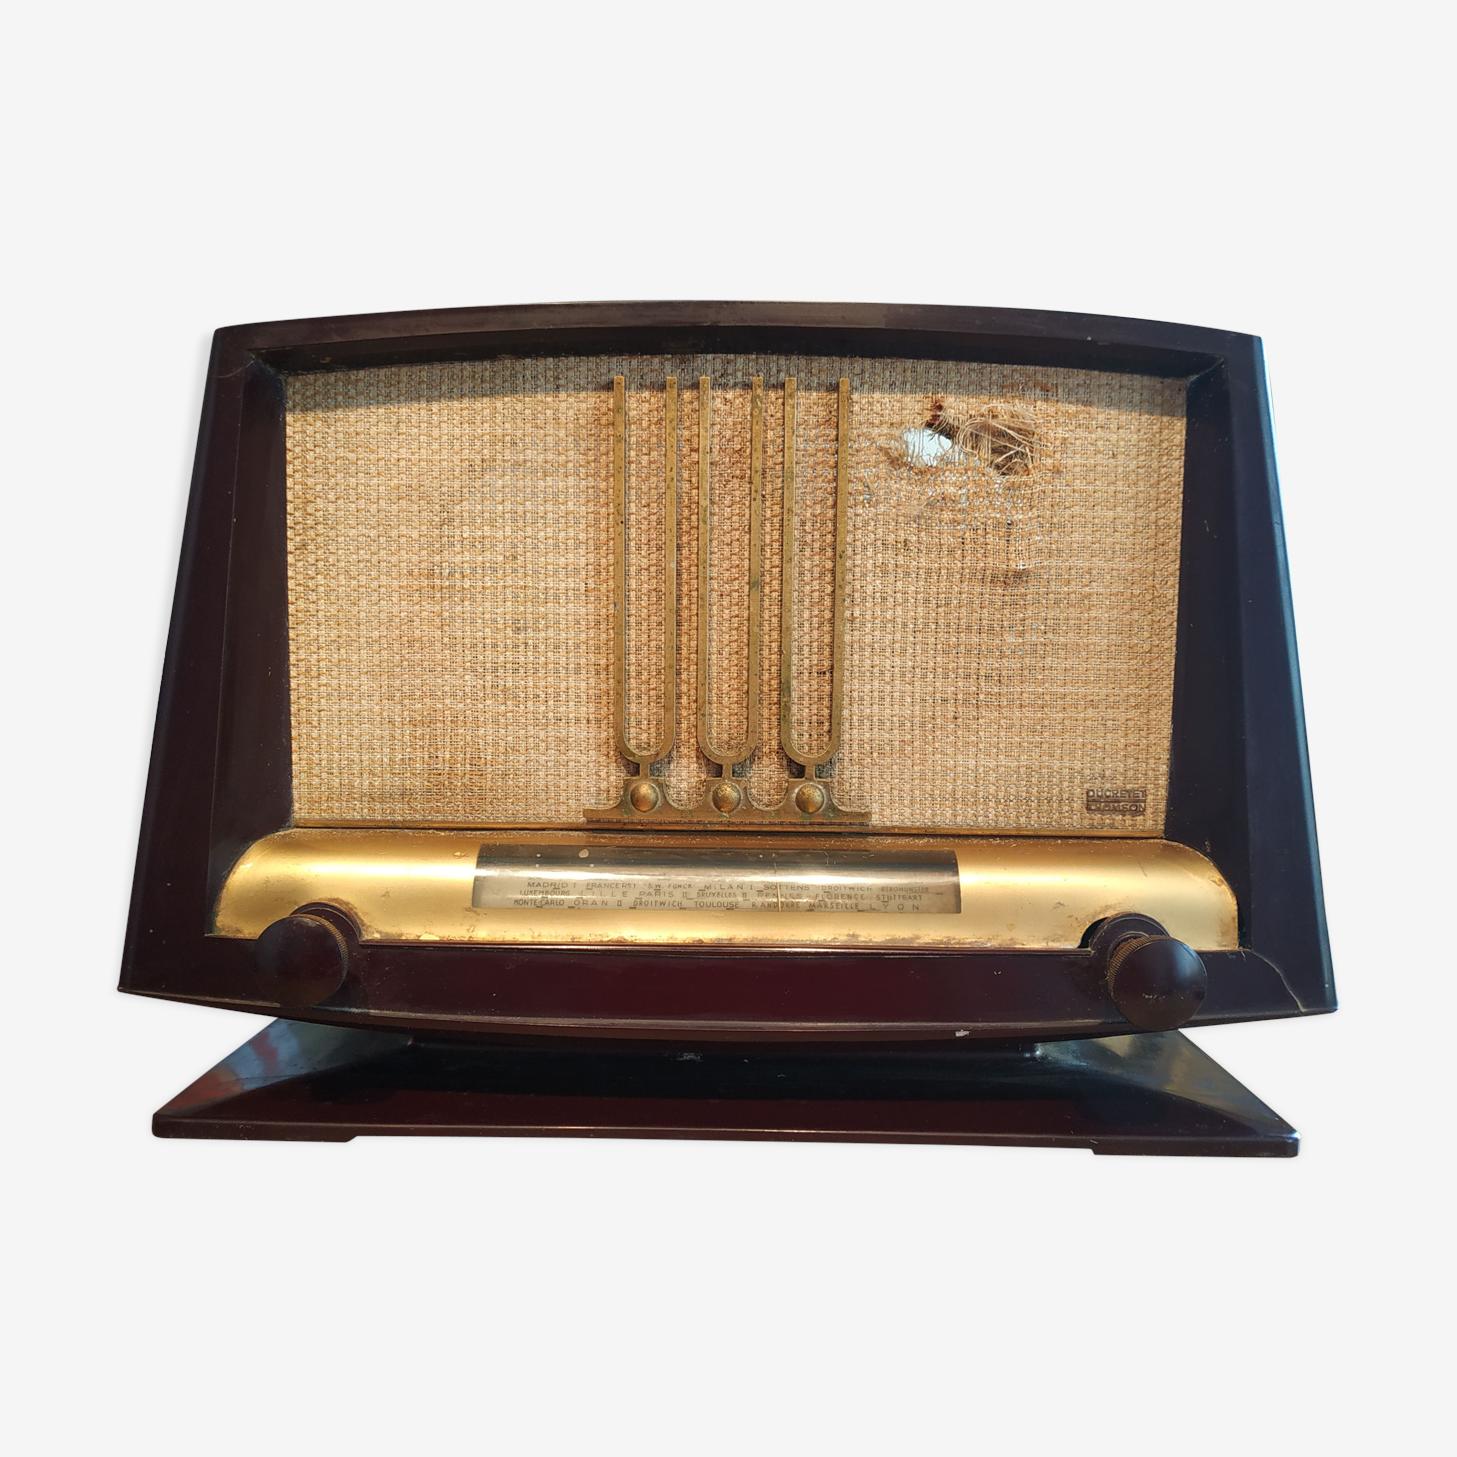 Radio tsf ducretet-thomson France model 1952 l135